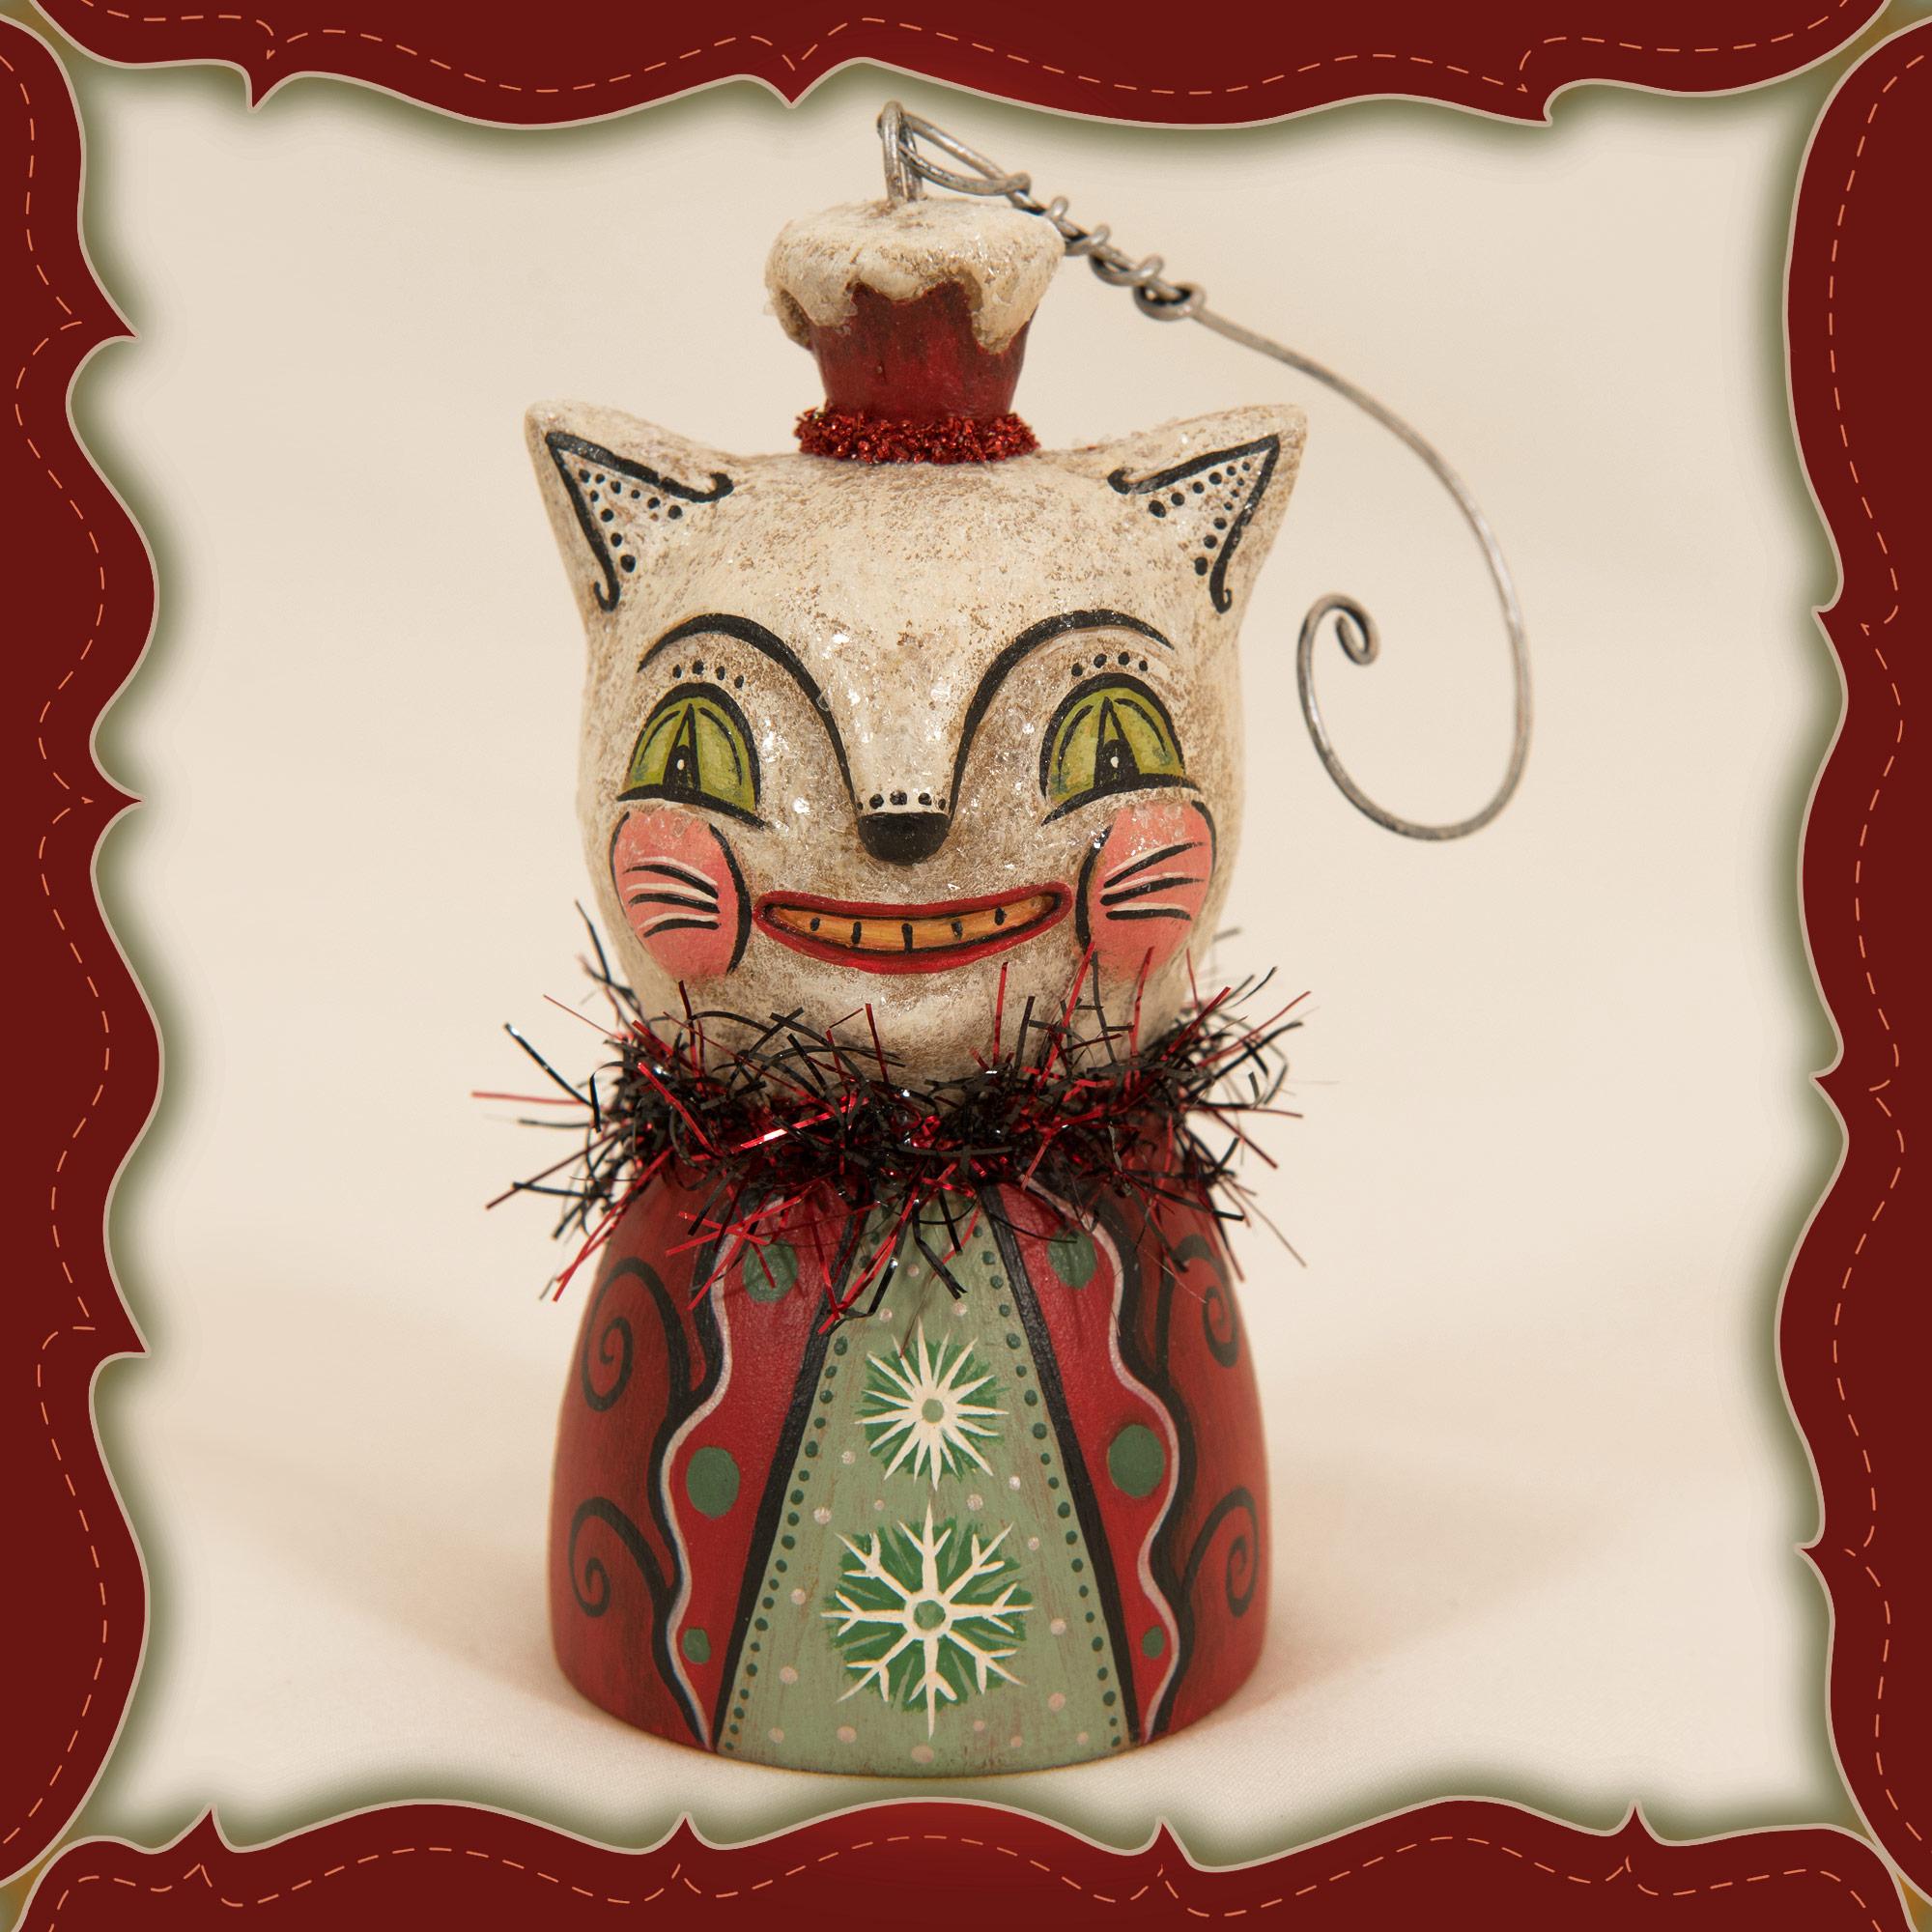 Johanna-Parker-Frosty-Grinning-Cat-Bell-Ornament-Frame-2.jpg